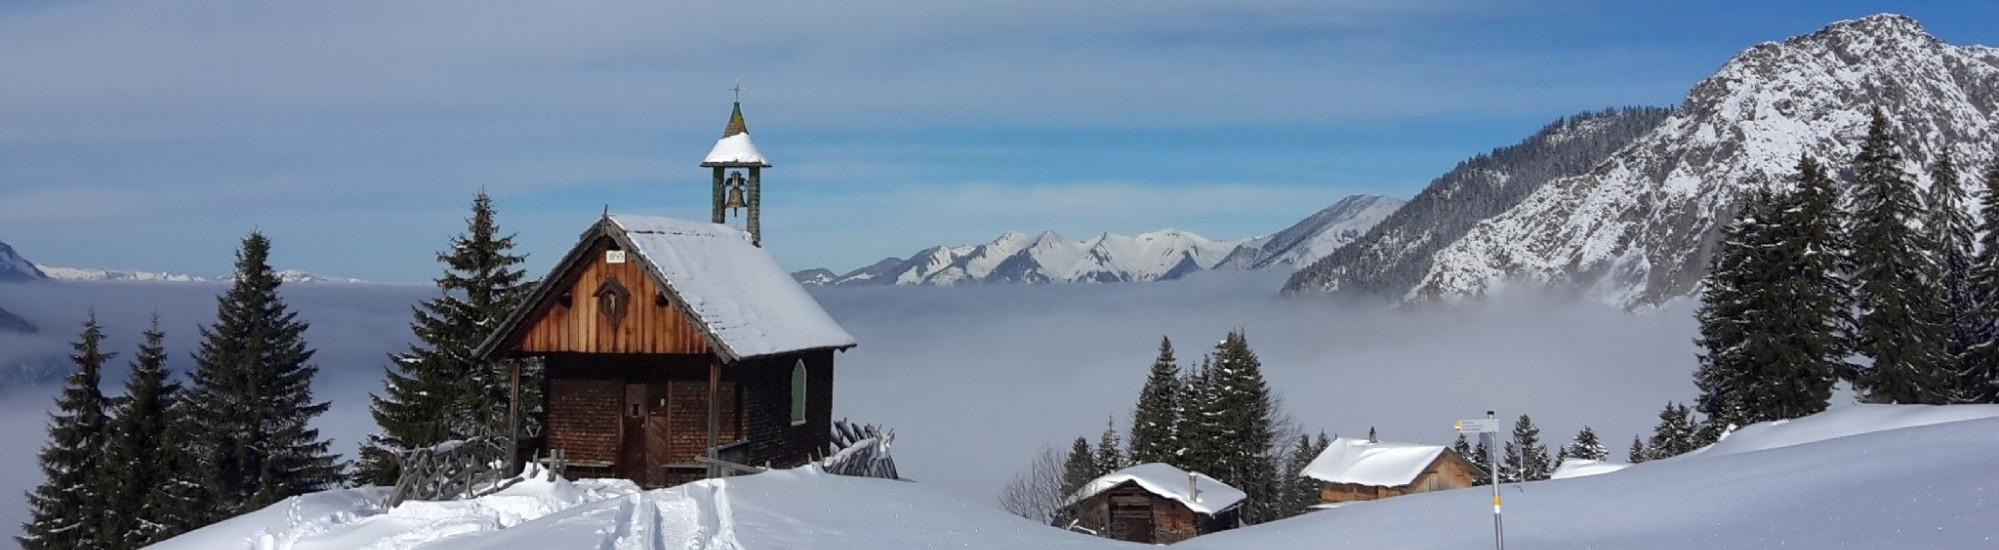 hotel-bergerhof-winterurlaub-montafon-1-s